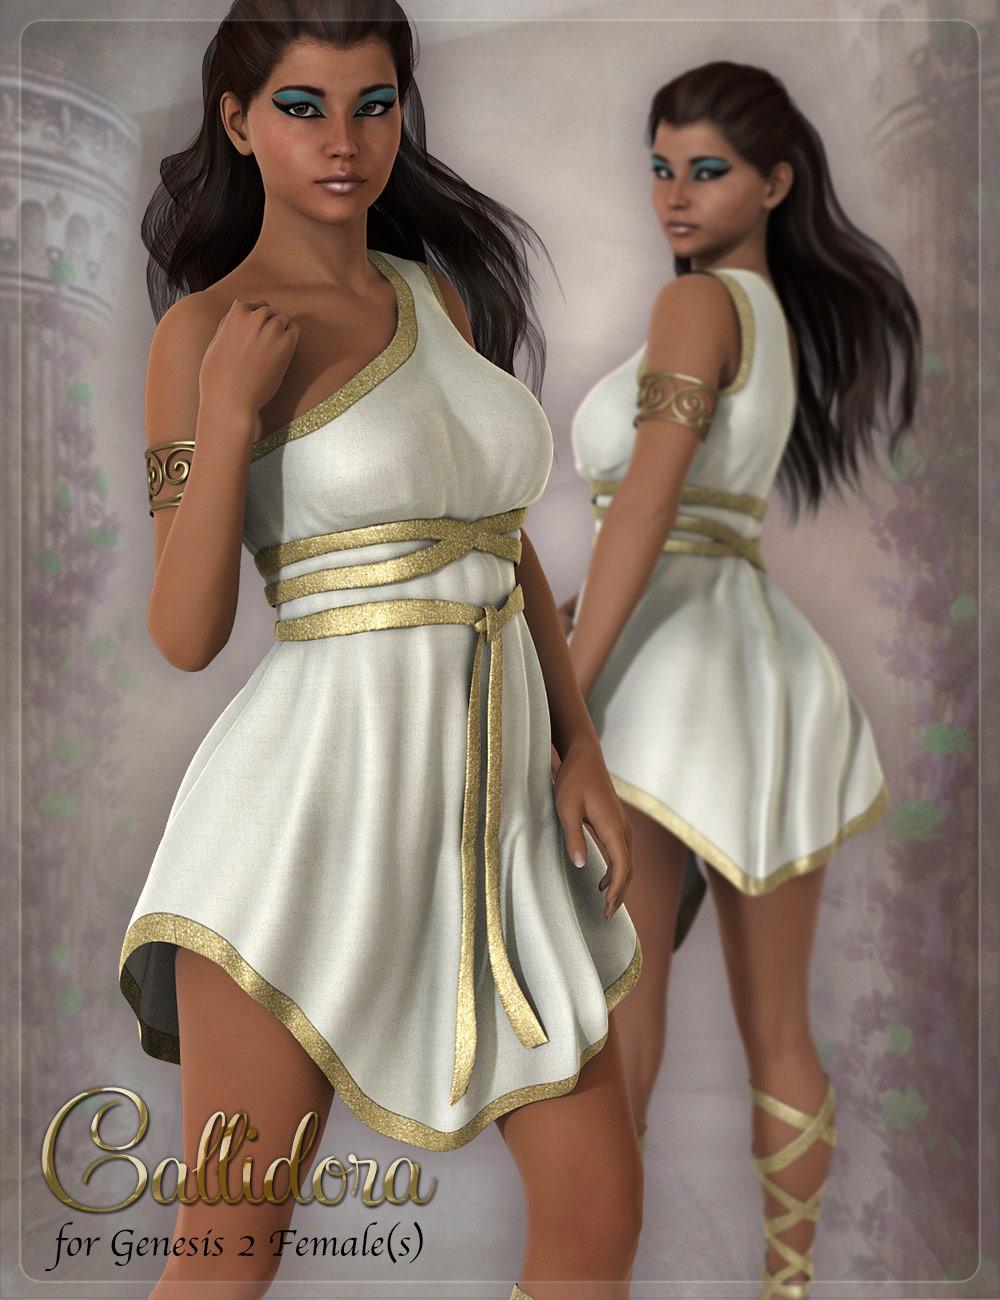 Callidora Outfit by: DemonicaEviliusJessaii, 3D Models by Daz 3D